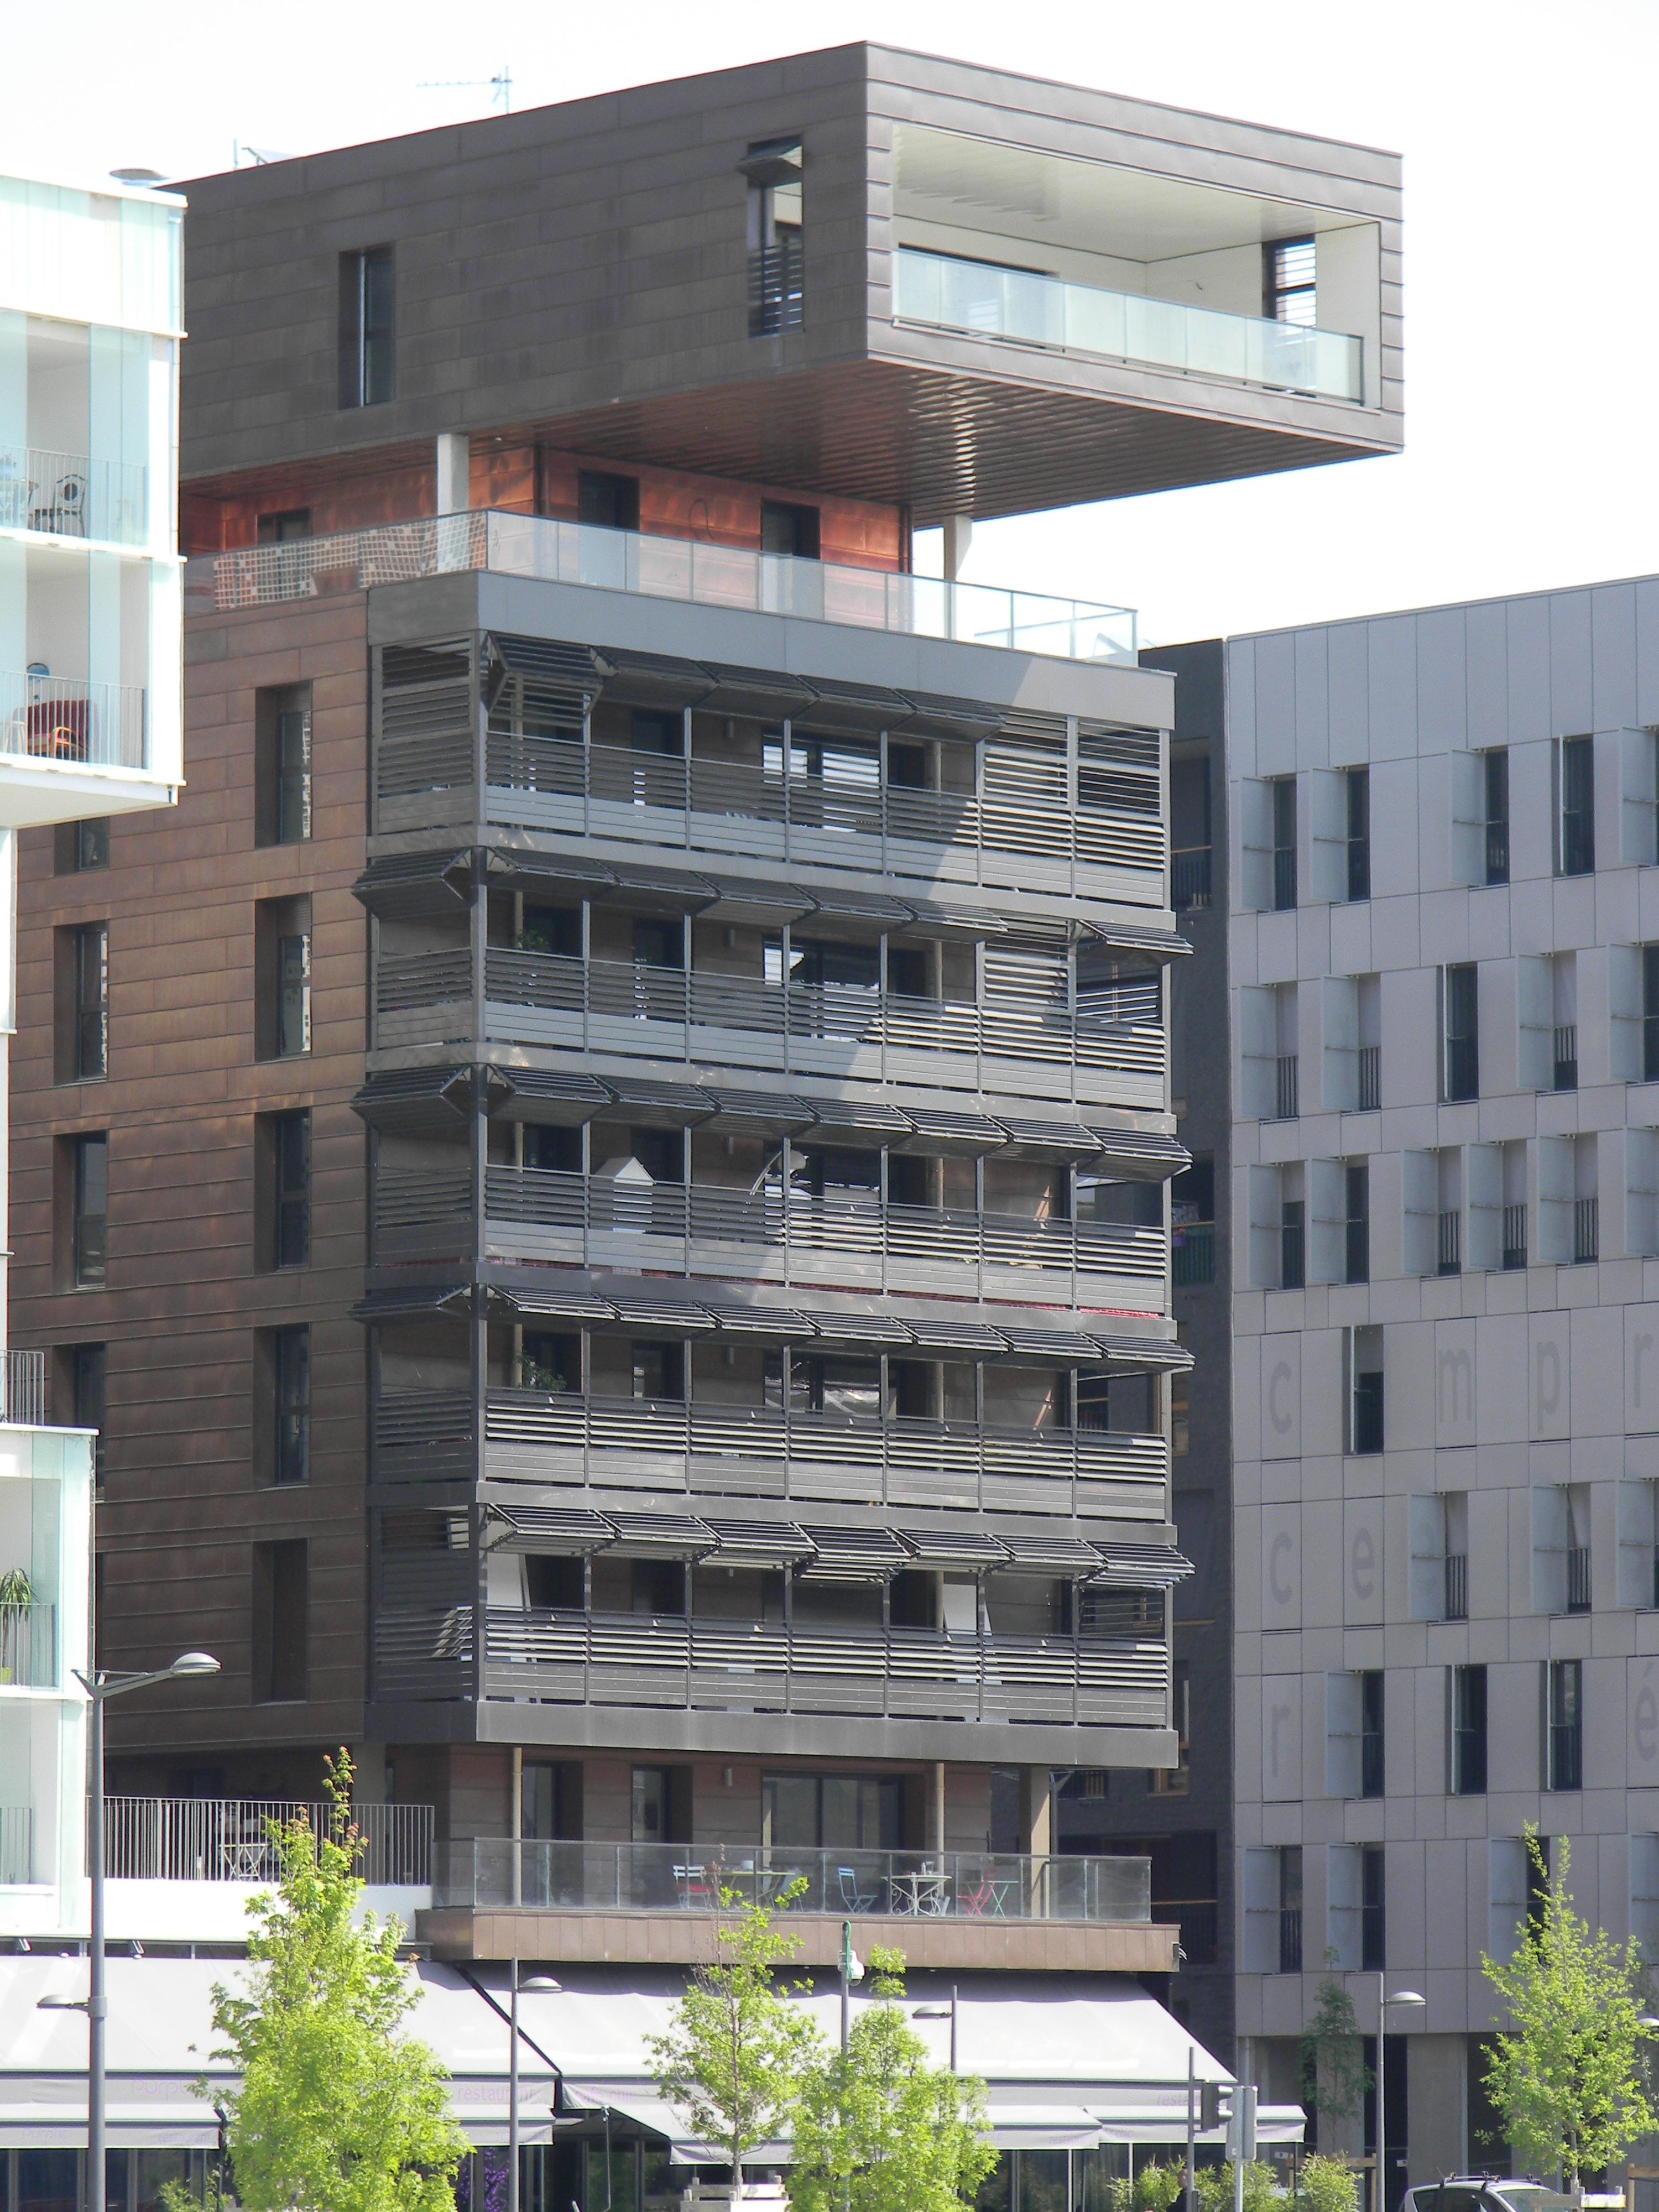 fichier confluence lyon batiment balcon profond jpg wikip dia. Black Bedroom Furniture Sets. Home Design Ideas